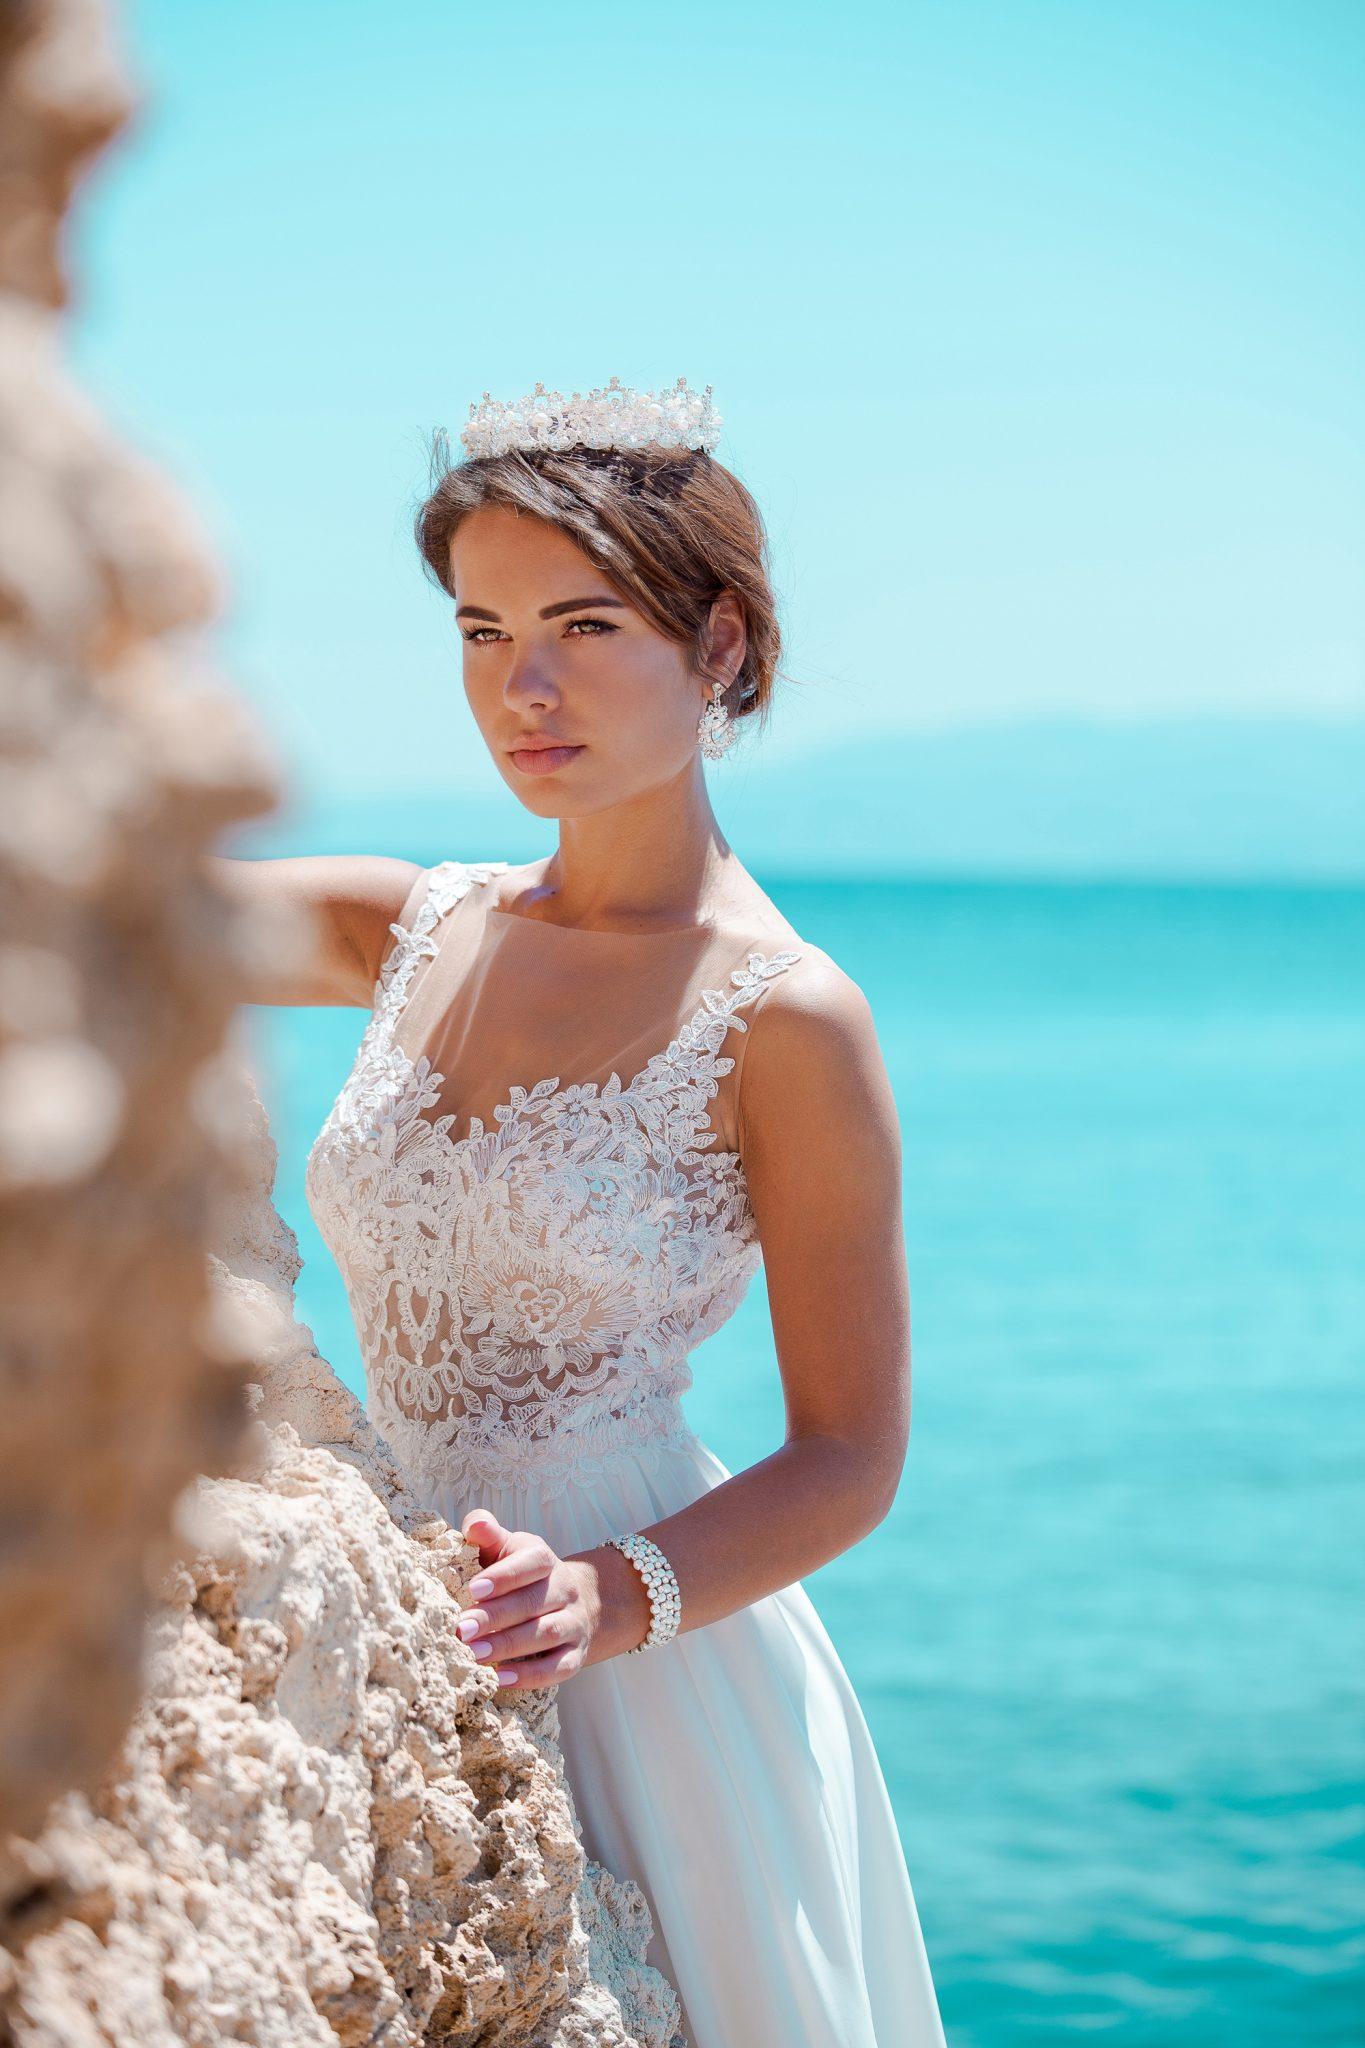 Wedding dresses | Wholesale wedding dresses - Julija Bridal Fashion